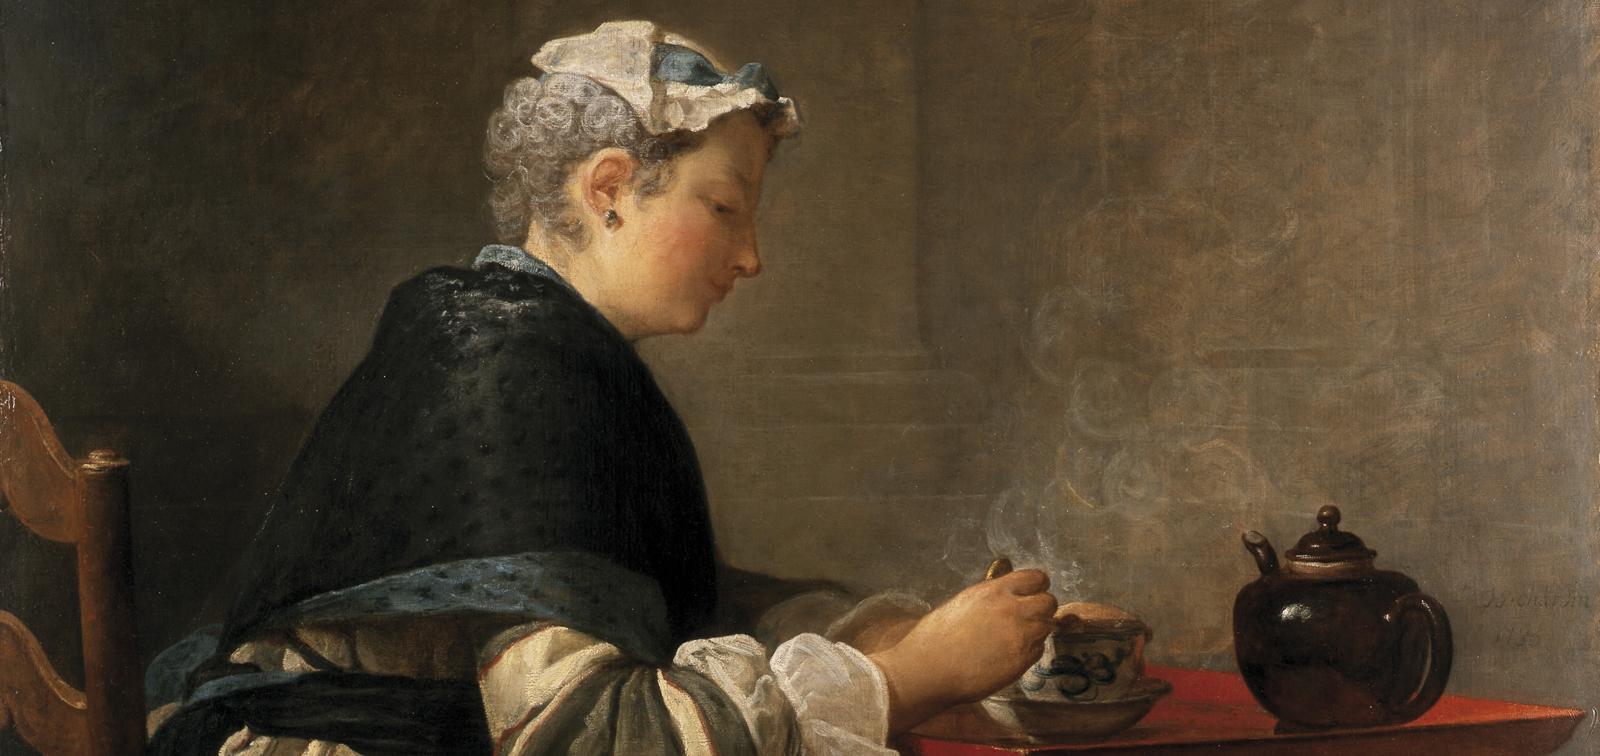 Chardin (1699-1779)